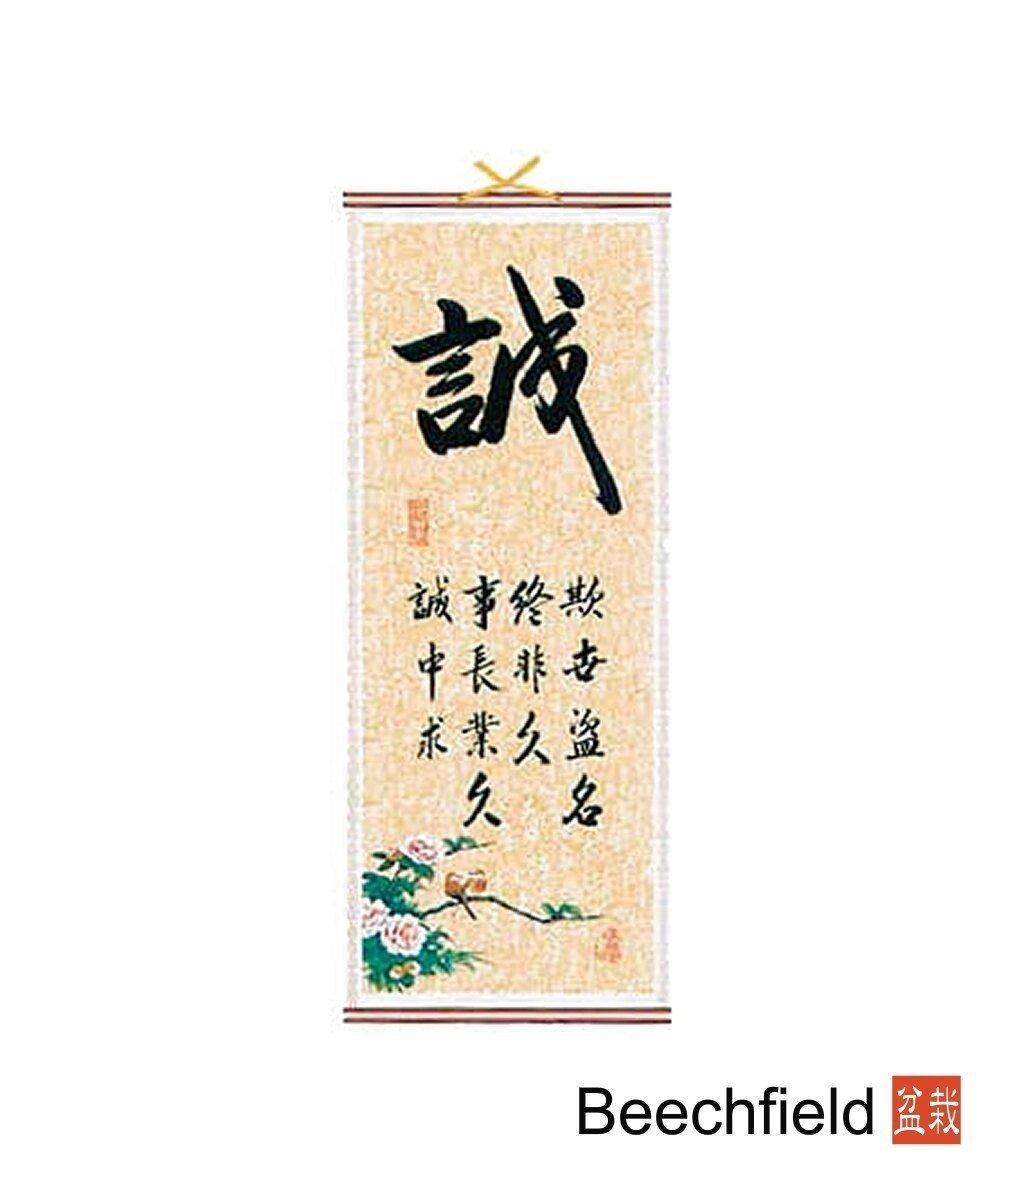 Cheng Calligraphy Hanging Scroll Beechfield Bonsai